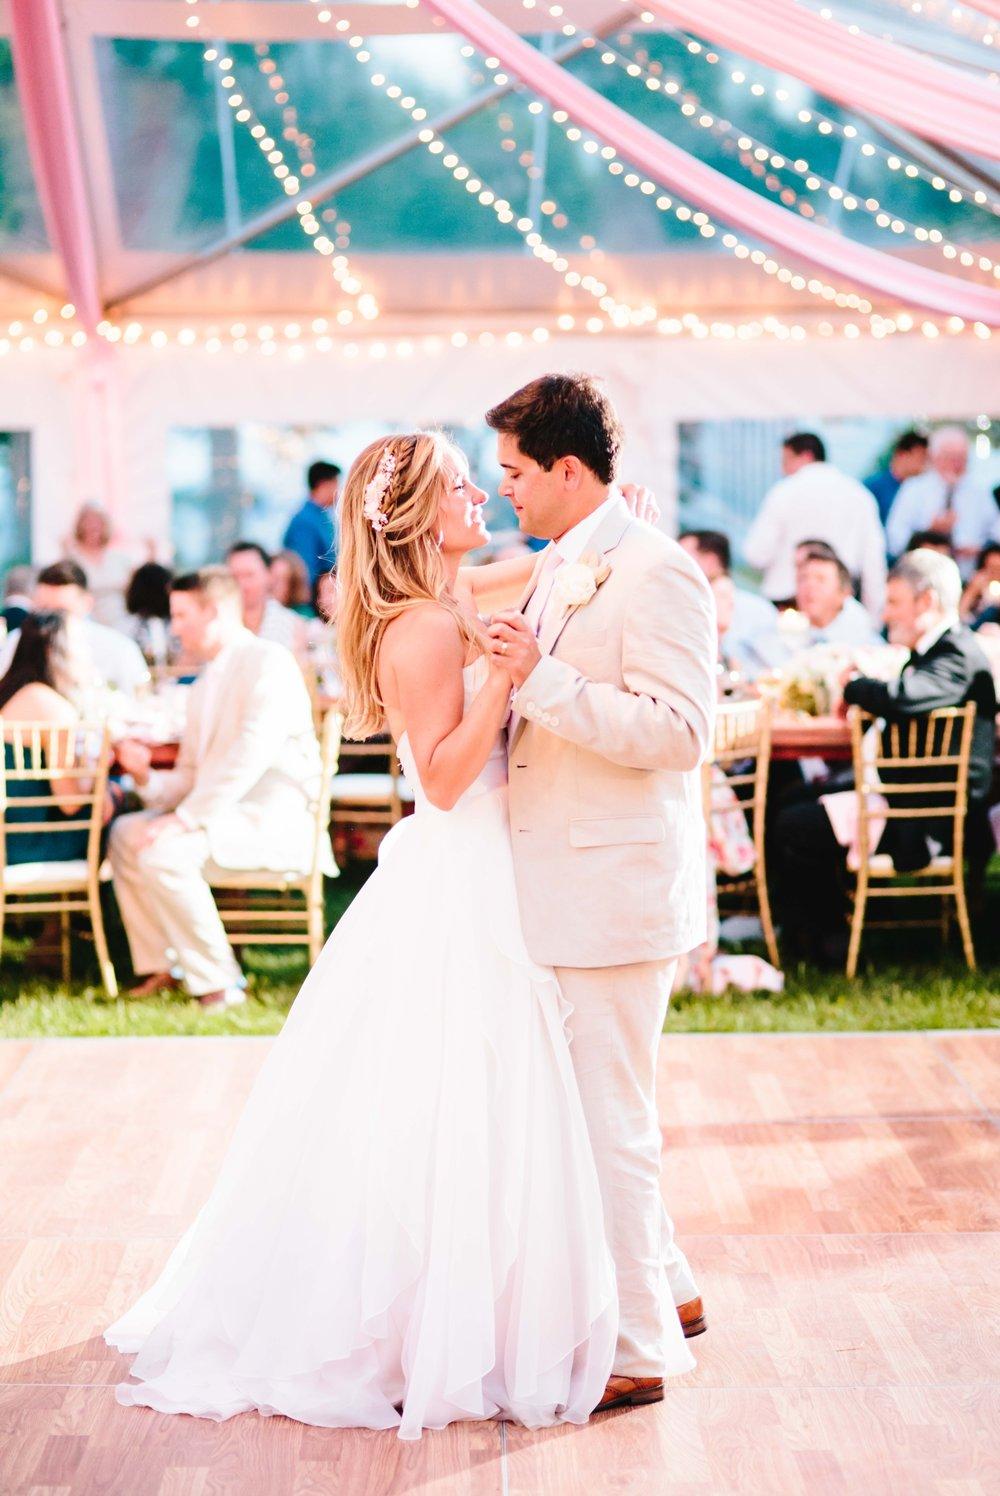 chicago-fine-art-wedding-photography-trenga52